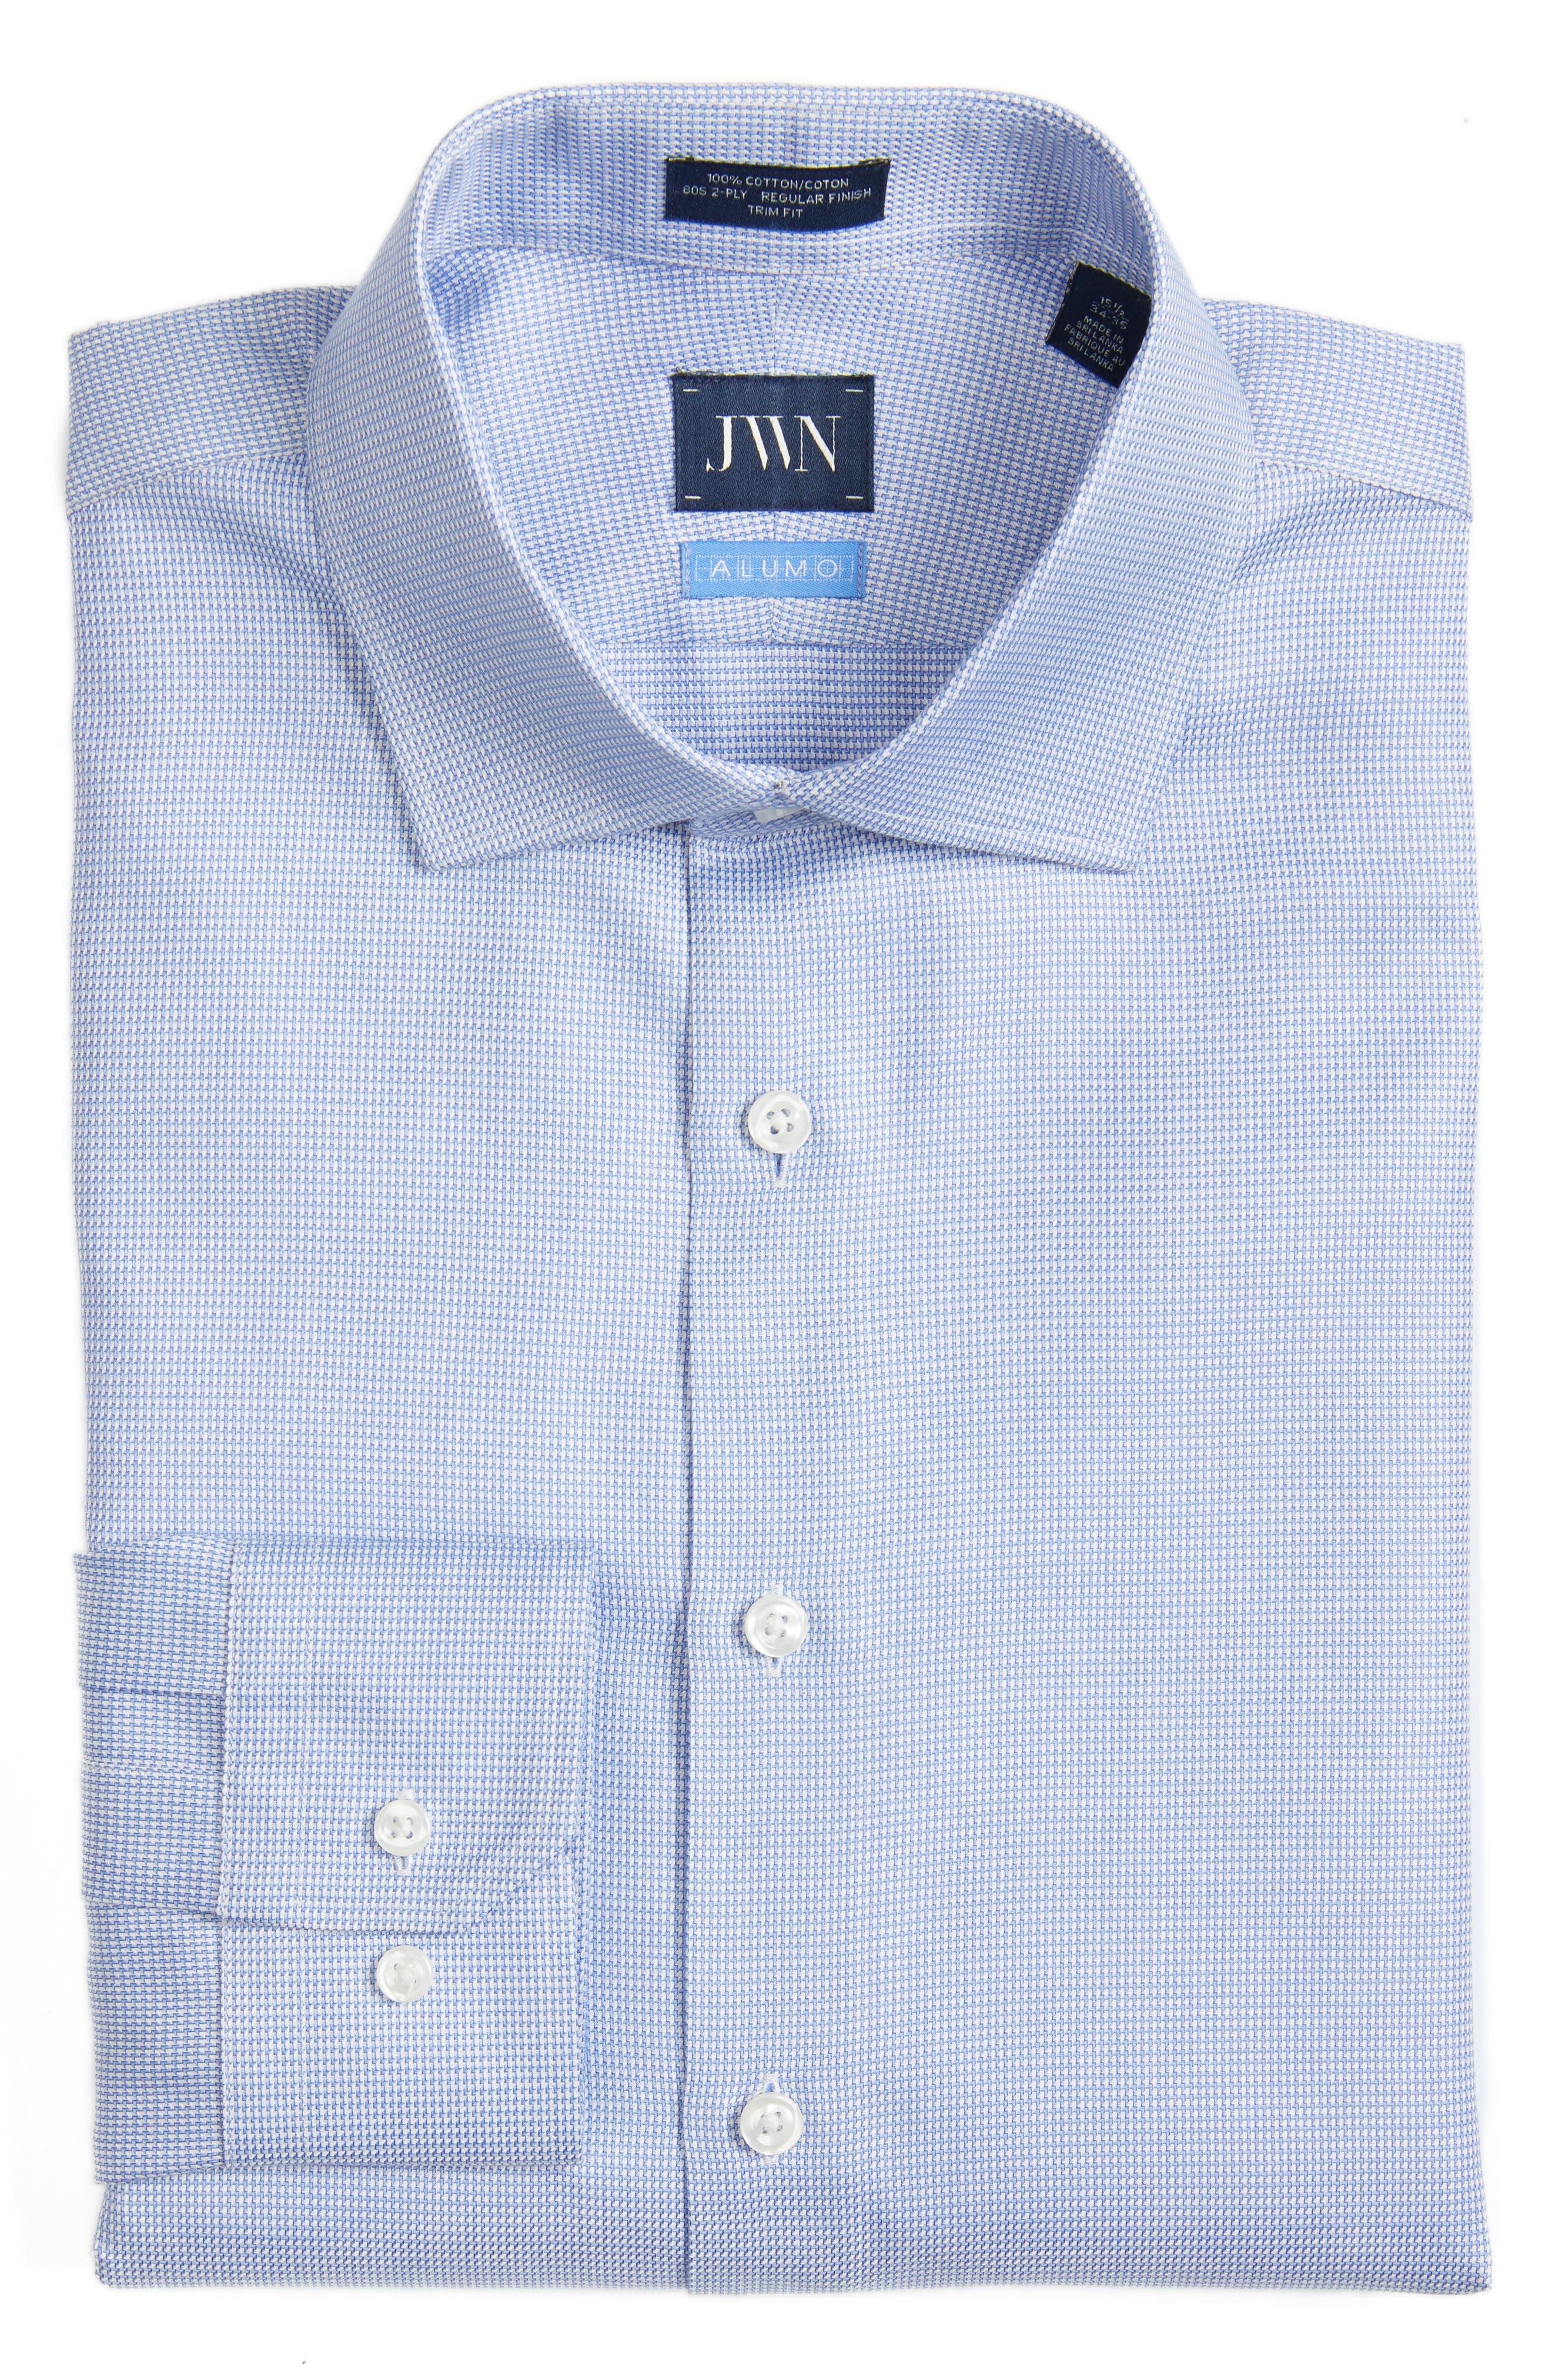 Alternate Image 1 Selected - John W. Nordstrom® Trim Fit Solid Dress Shirt